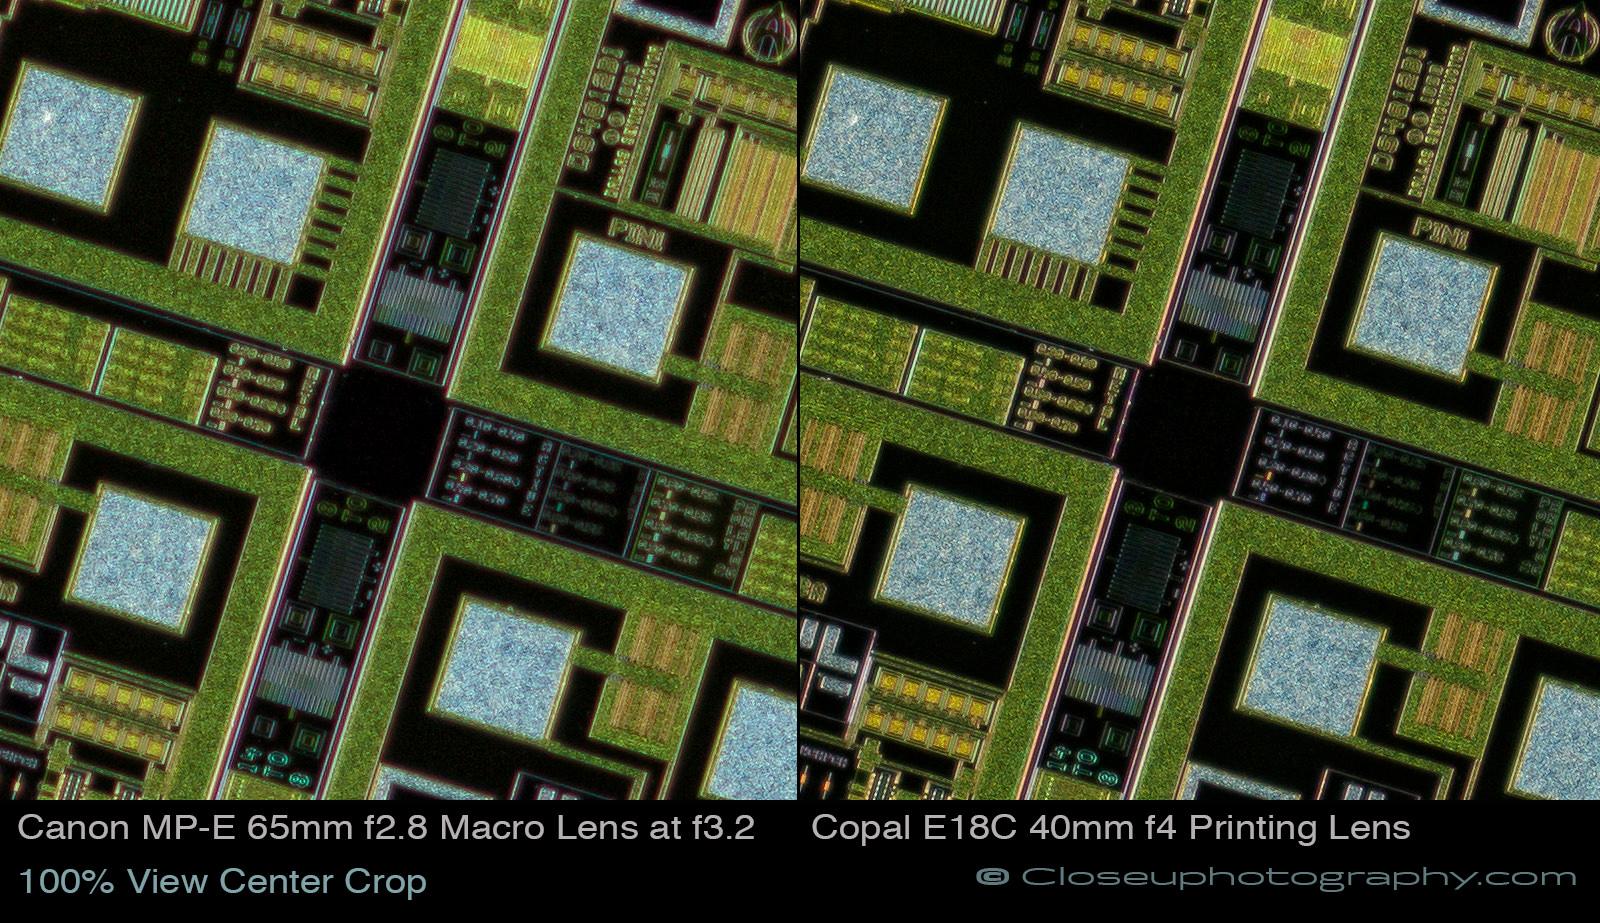 100-percent-view-center-crop-Canon-MPE-65-vs-Copal-E18C-40mm-at-3.4x-www-Closeuphotography-com.jpg